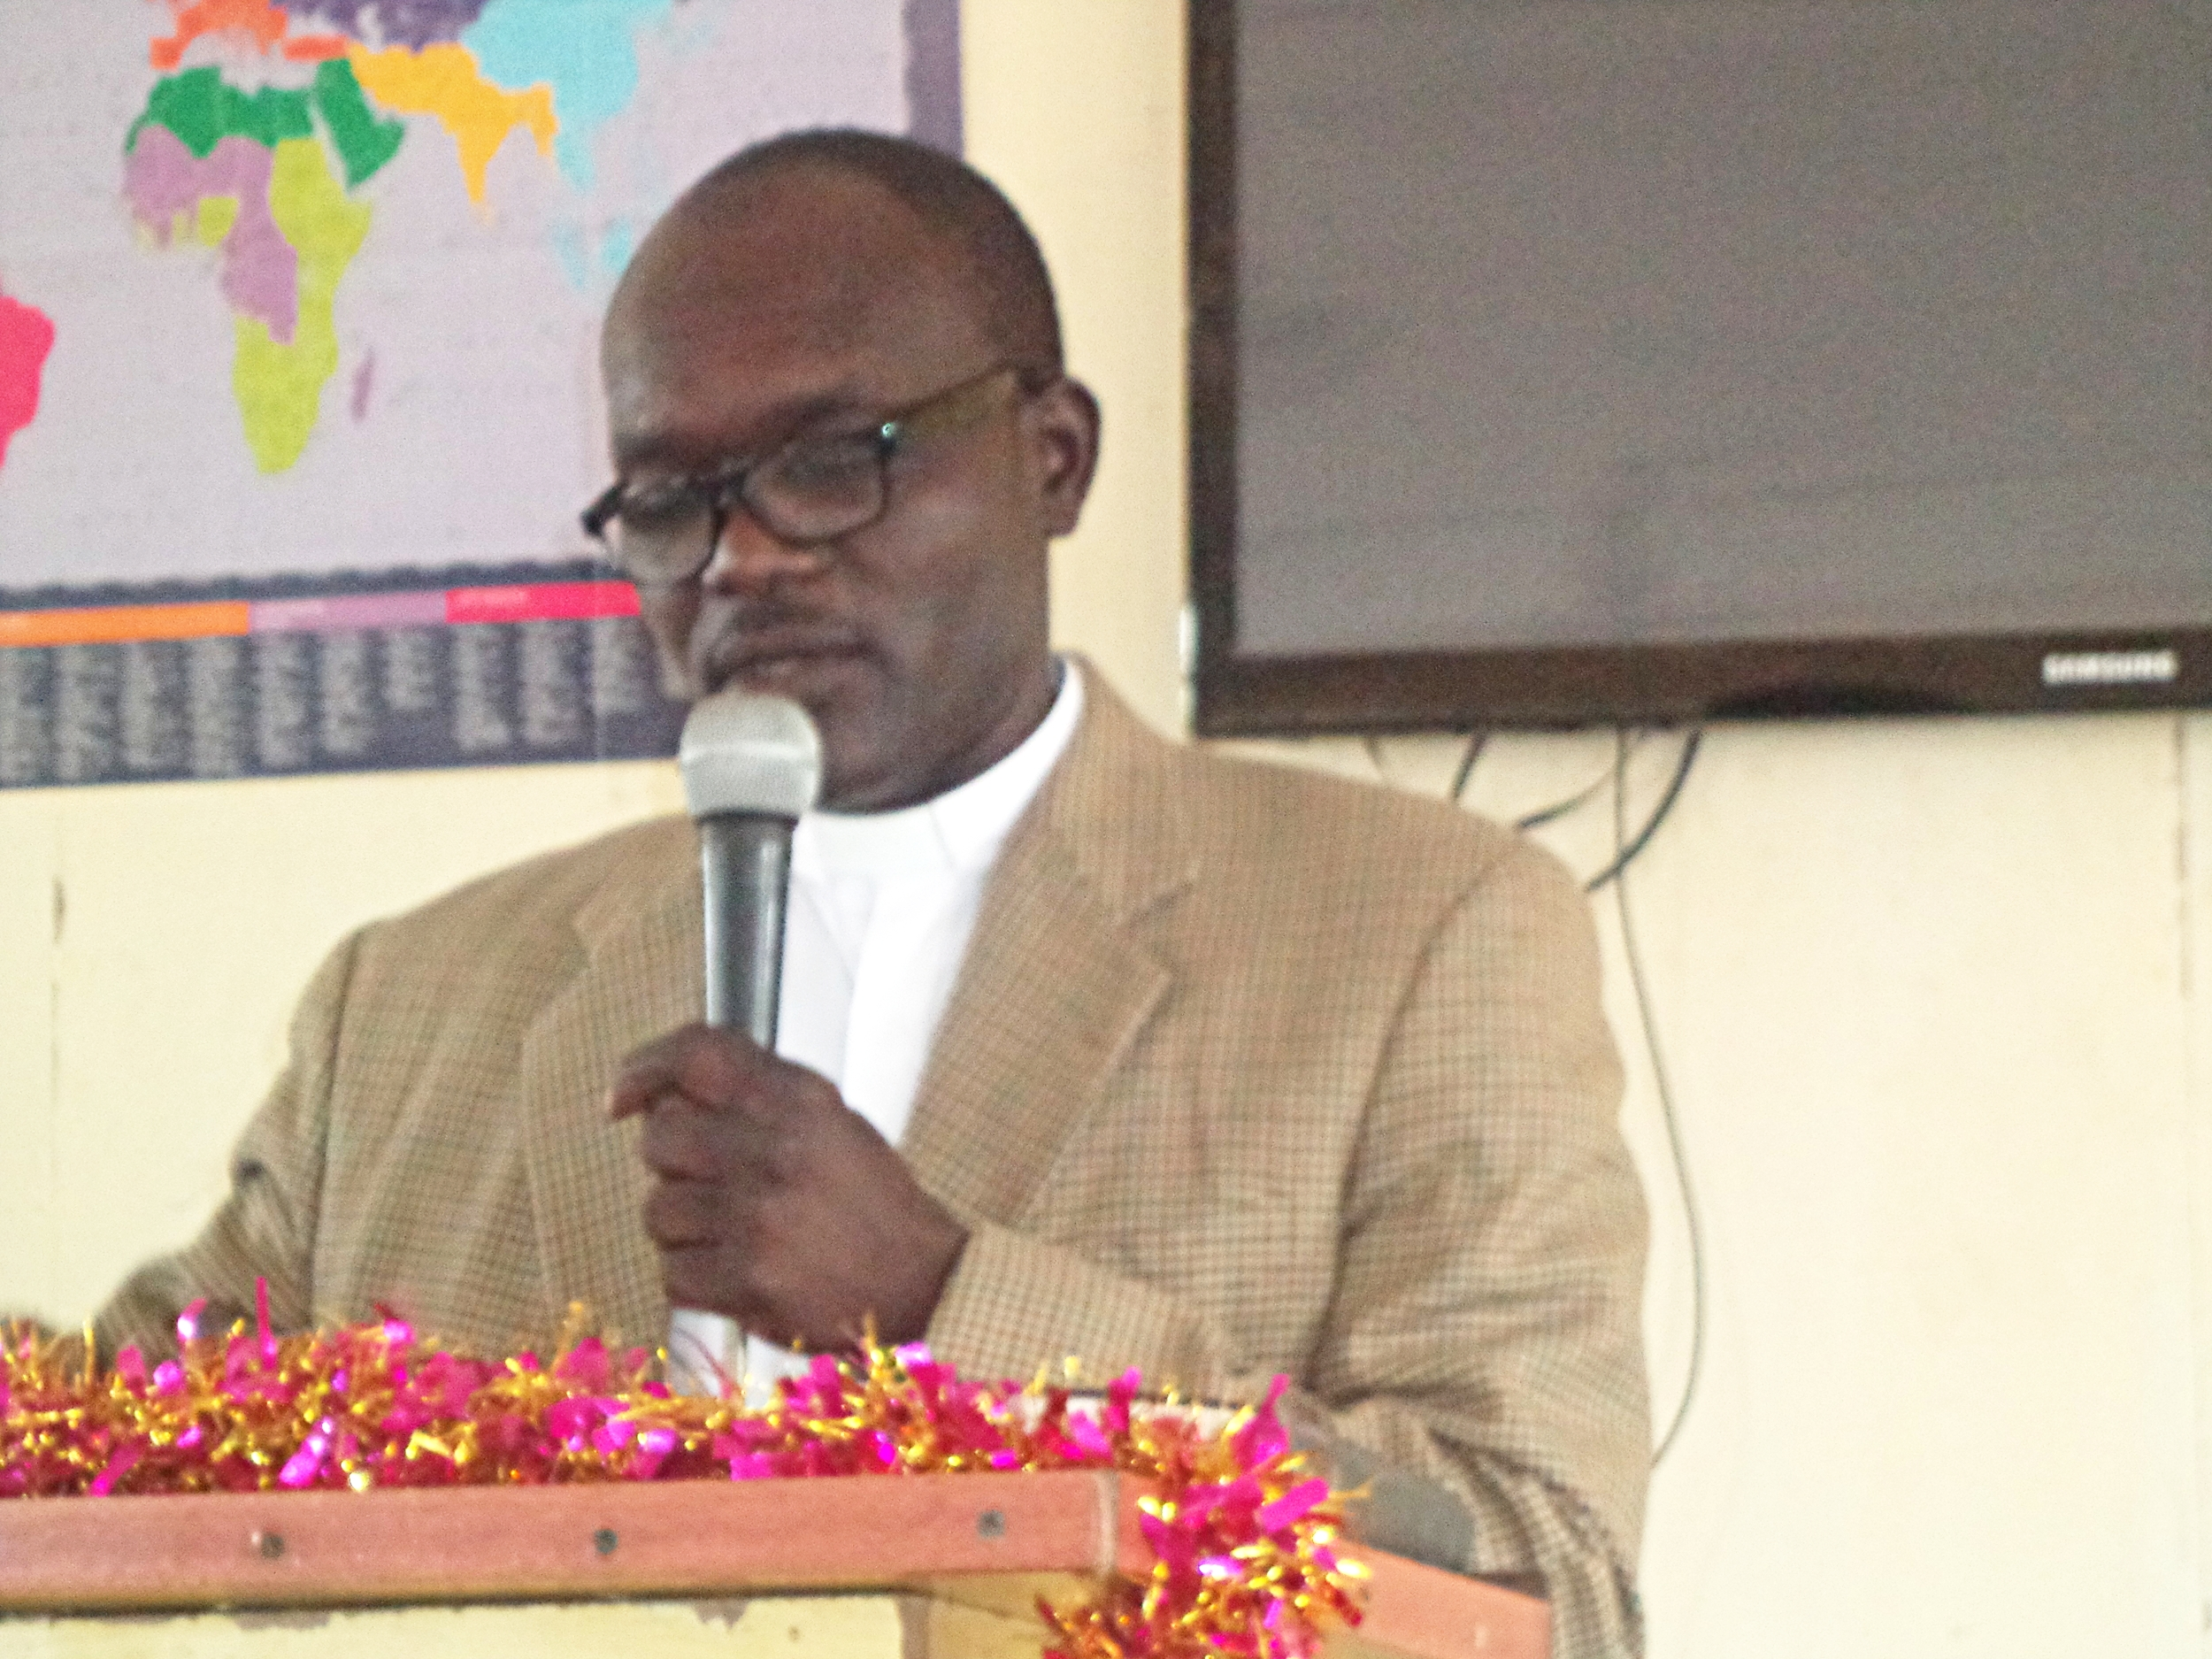 Rev. Nasser Kajou, Nubian Missionary